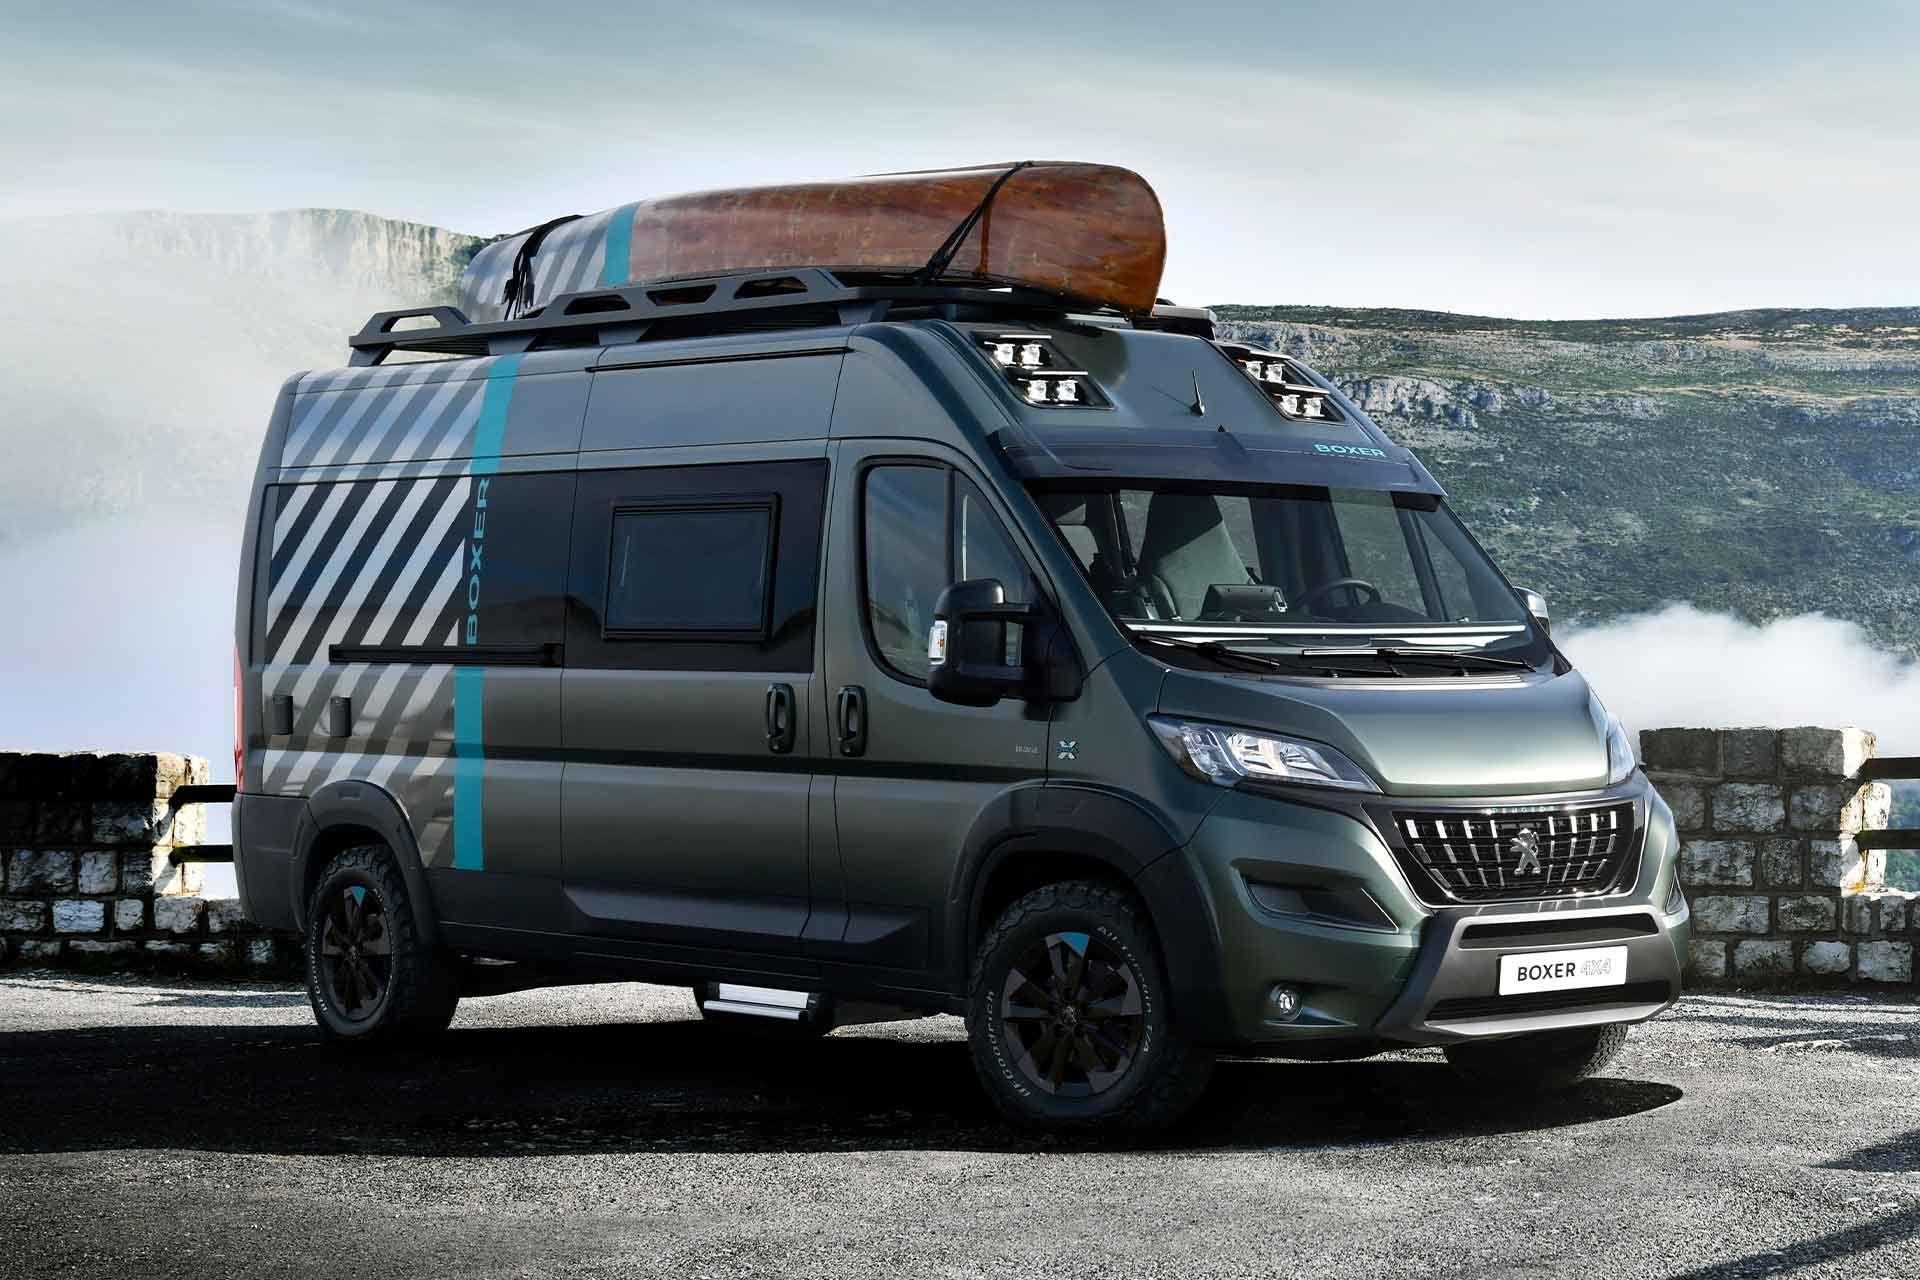 Peugeot Boxer 8×8 Camper Van Concept  Peugeot, Mercedes truck, Van